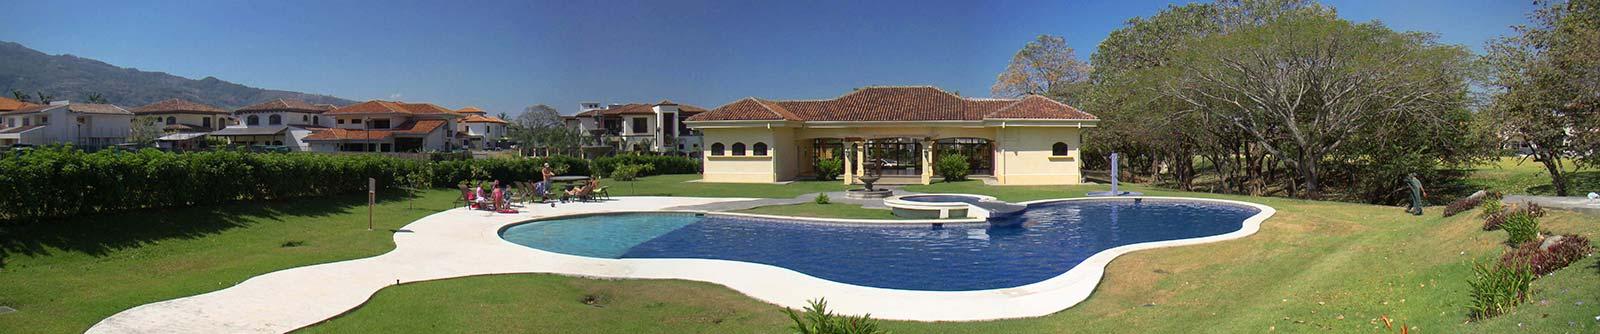 Hacienda del Sol, Santa Ana, Land, Lots, for sale, Gated community, top location, swimming pool, tennis court